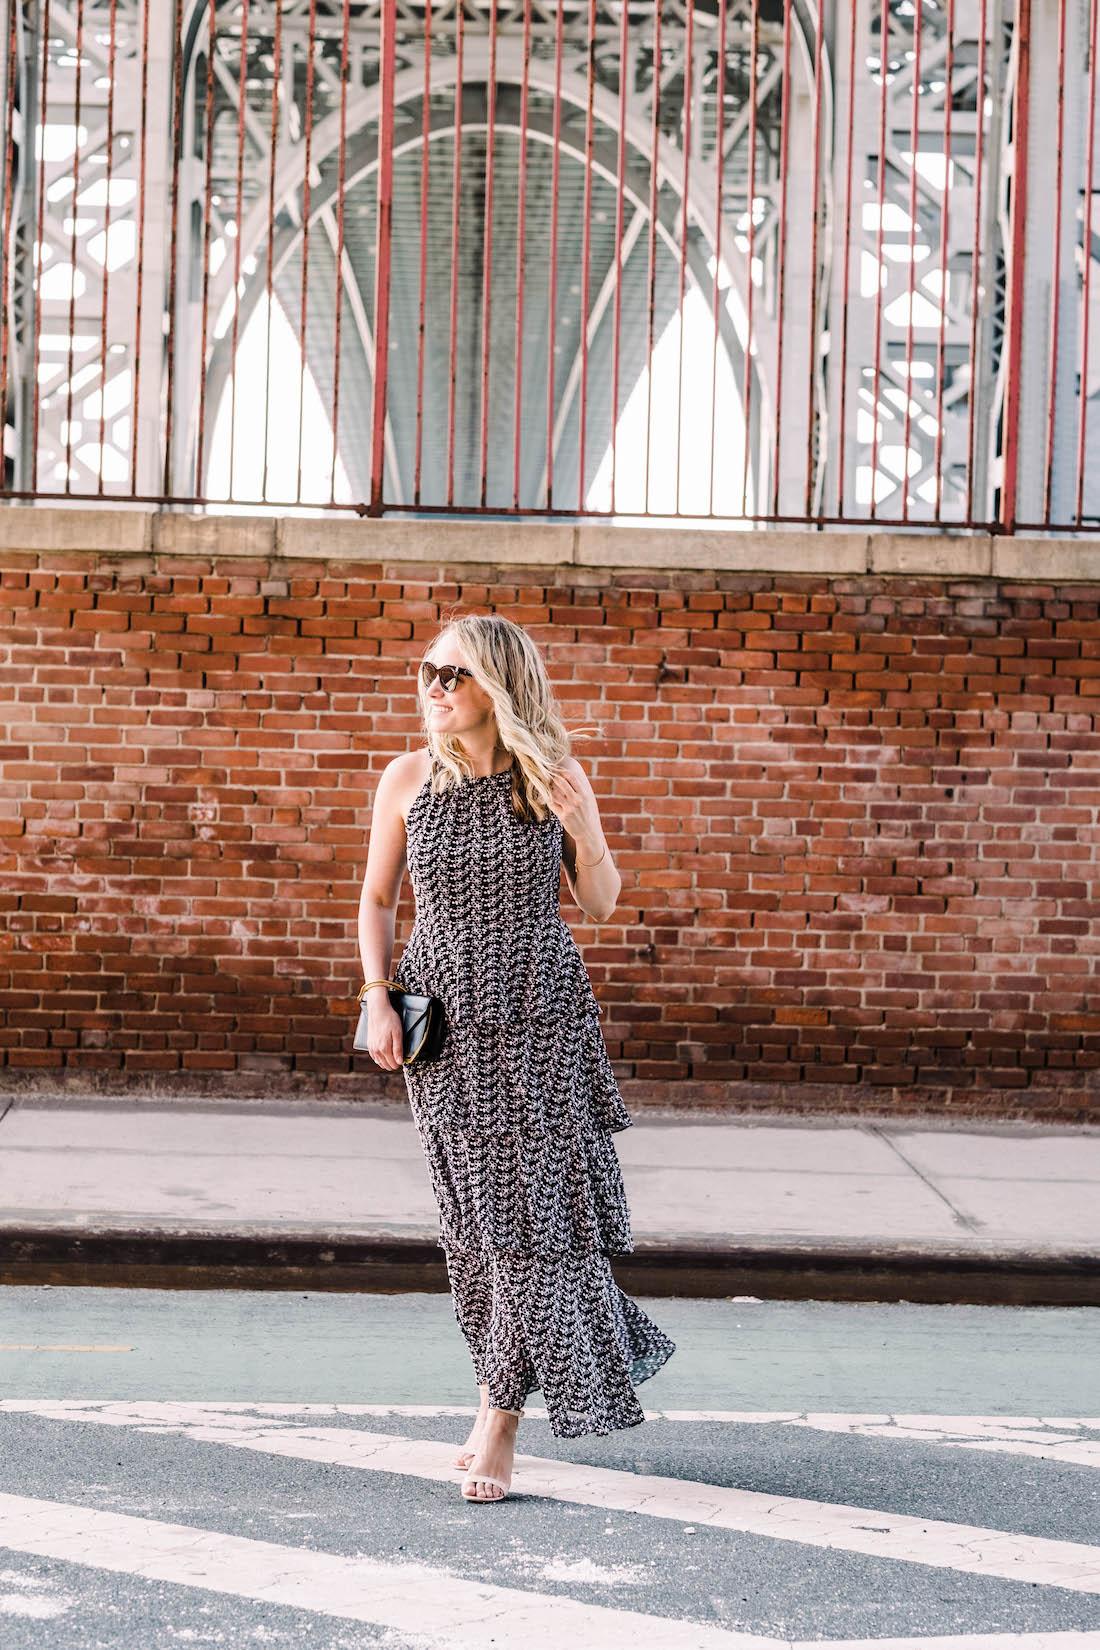 favorite new maxi dress - the stripe